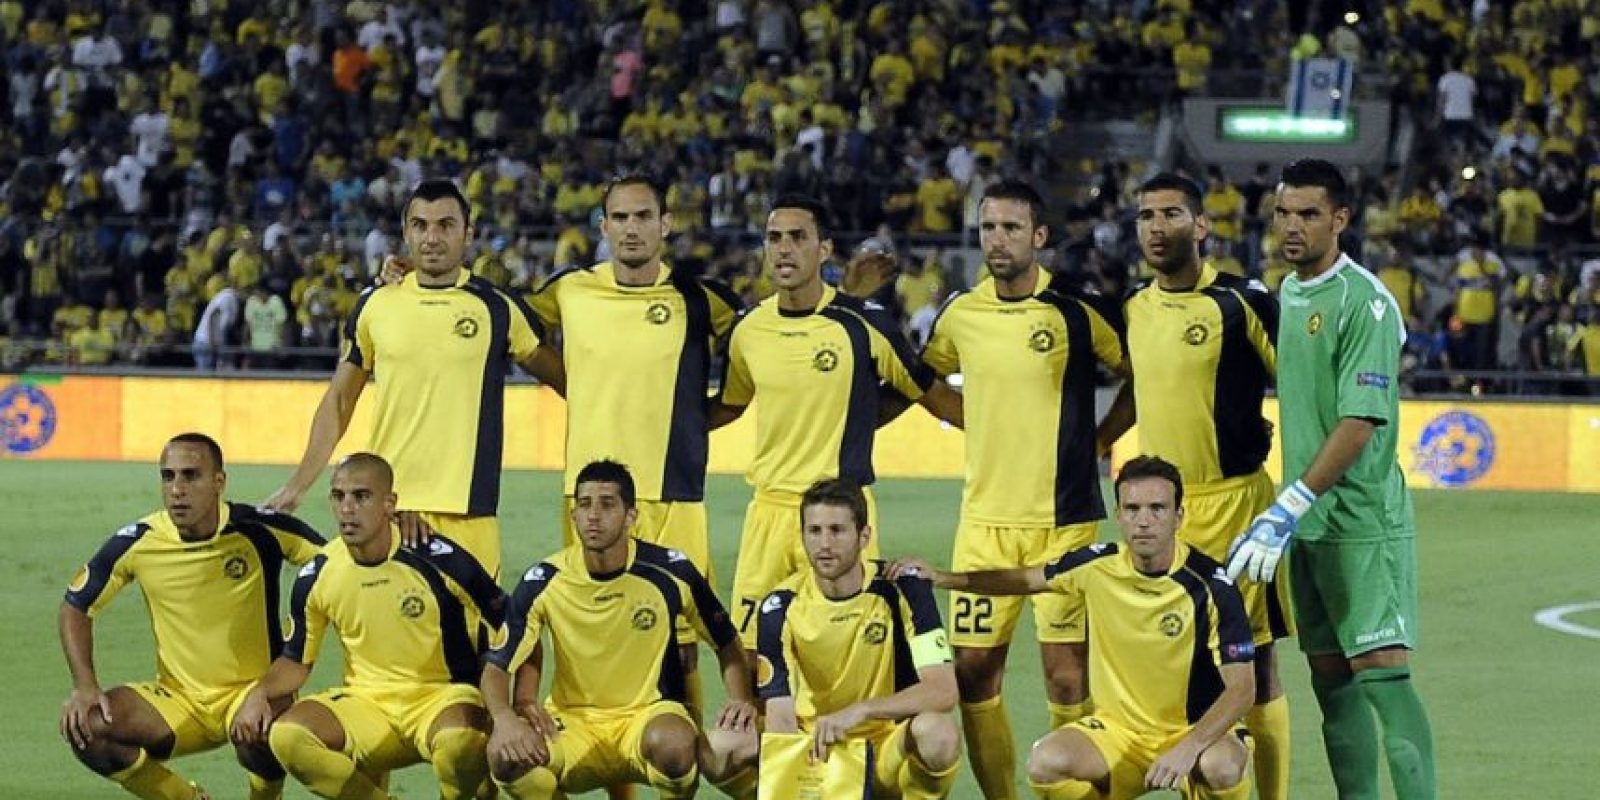 Maccabi Tel Aviv (Israel) Foto:Getty Images